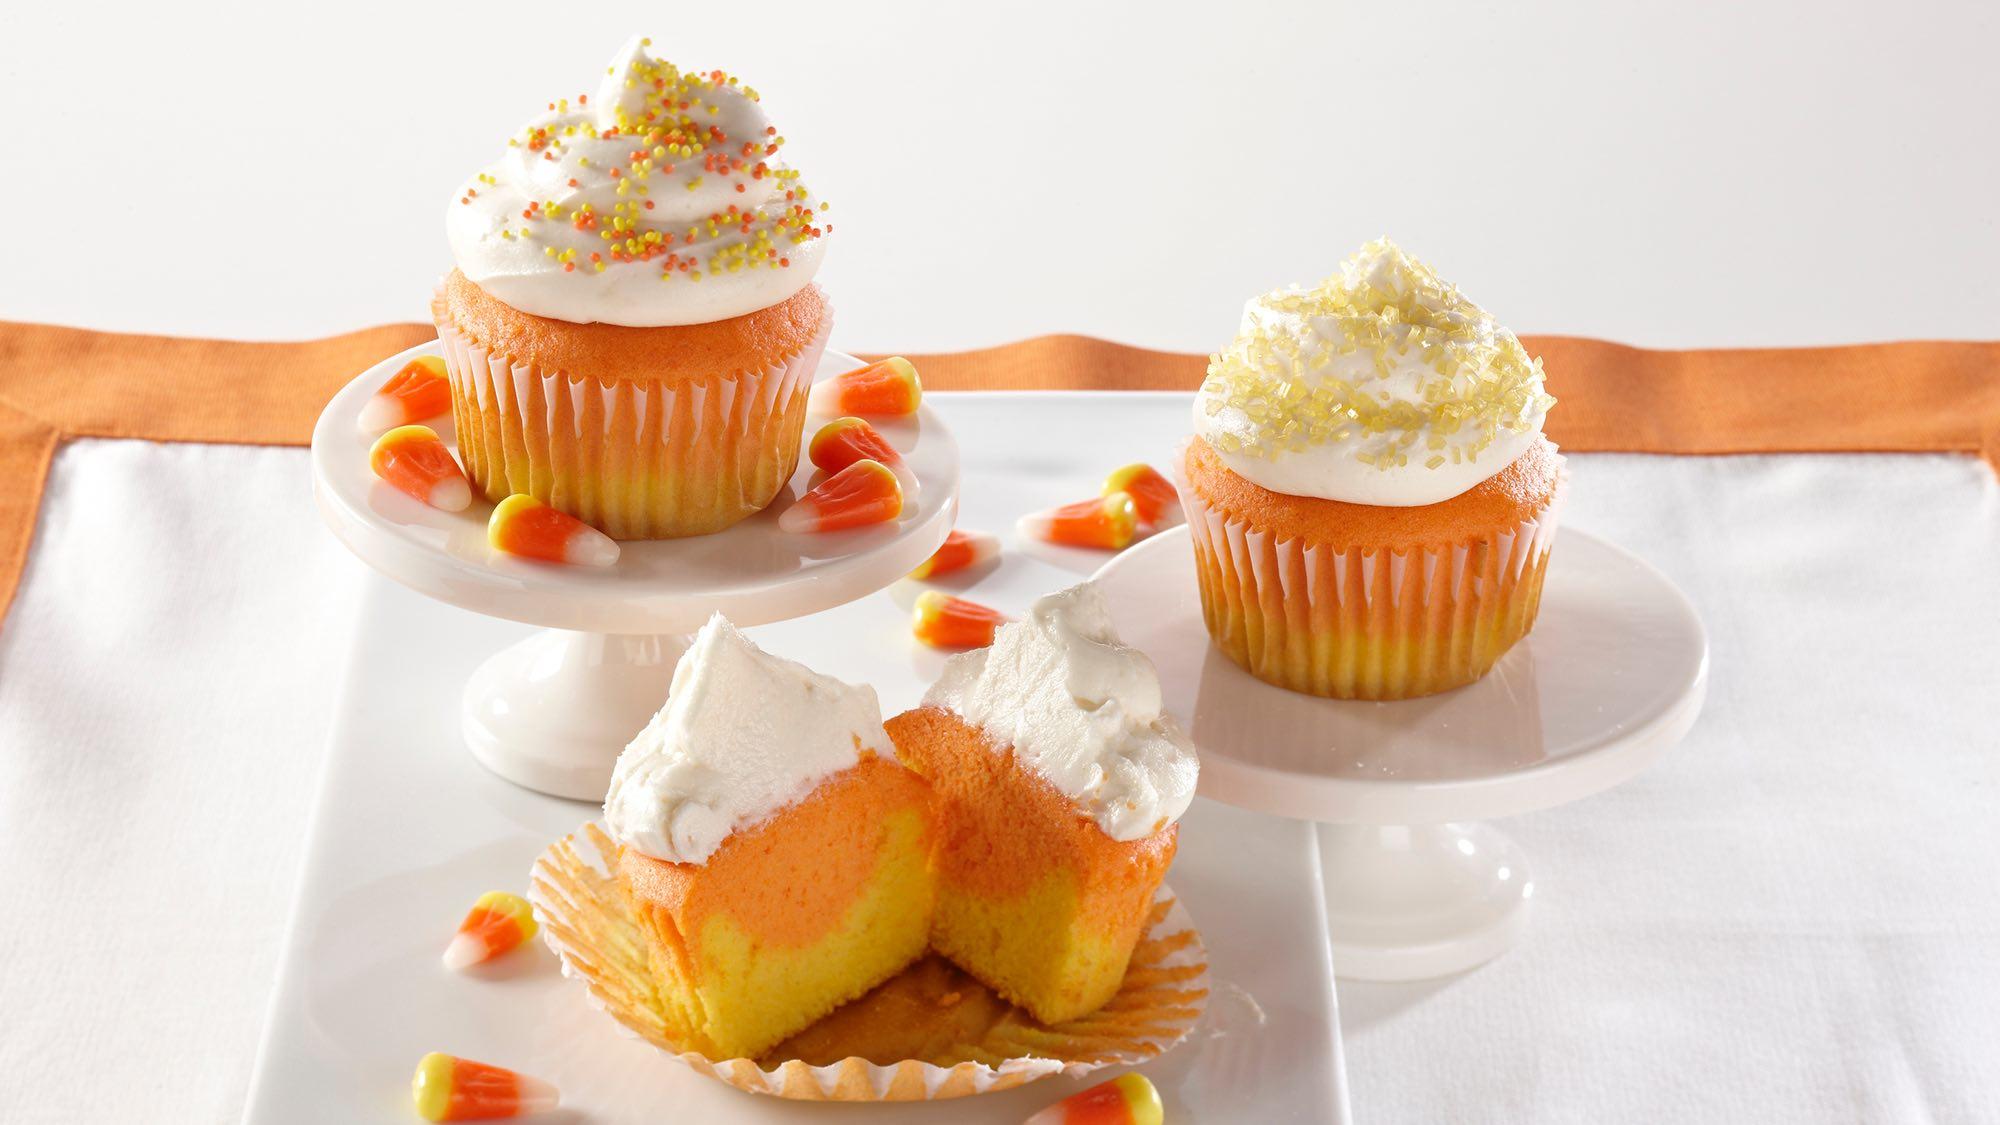 McCormick Candy Corn Cupcakes